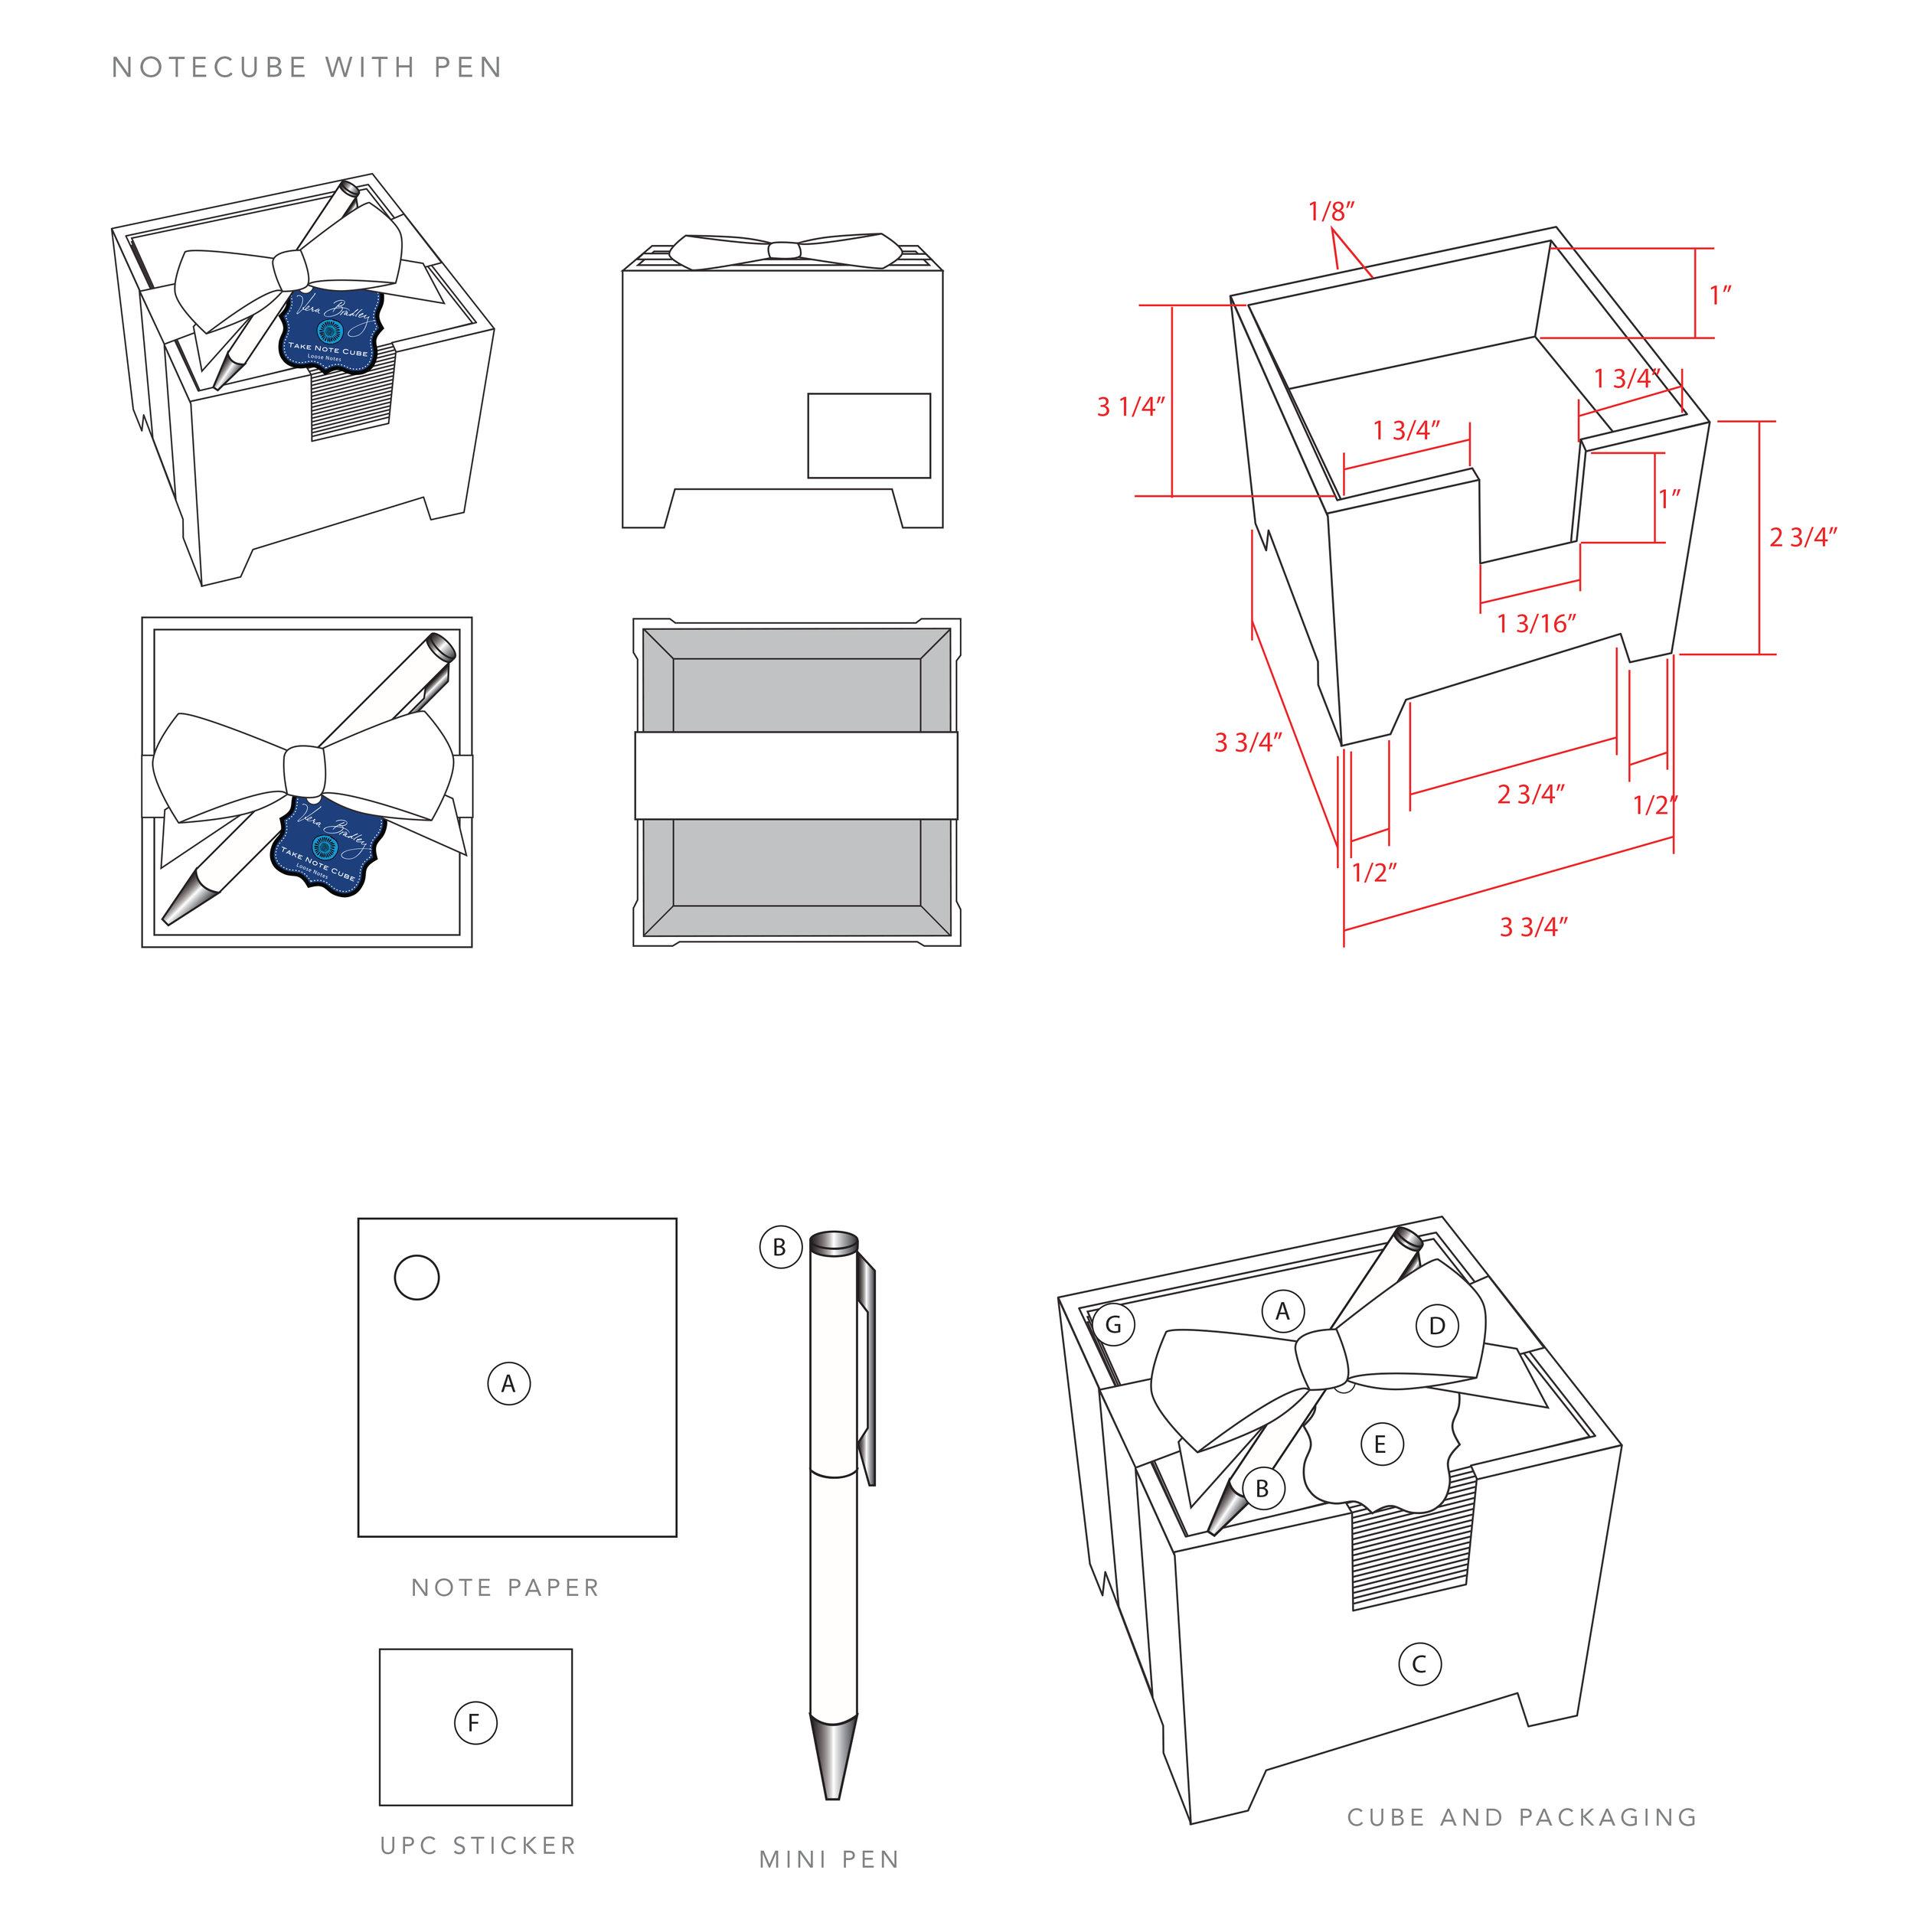 Notecub-with-Pen-Technical.jpg